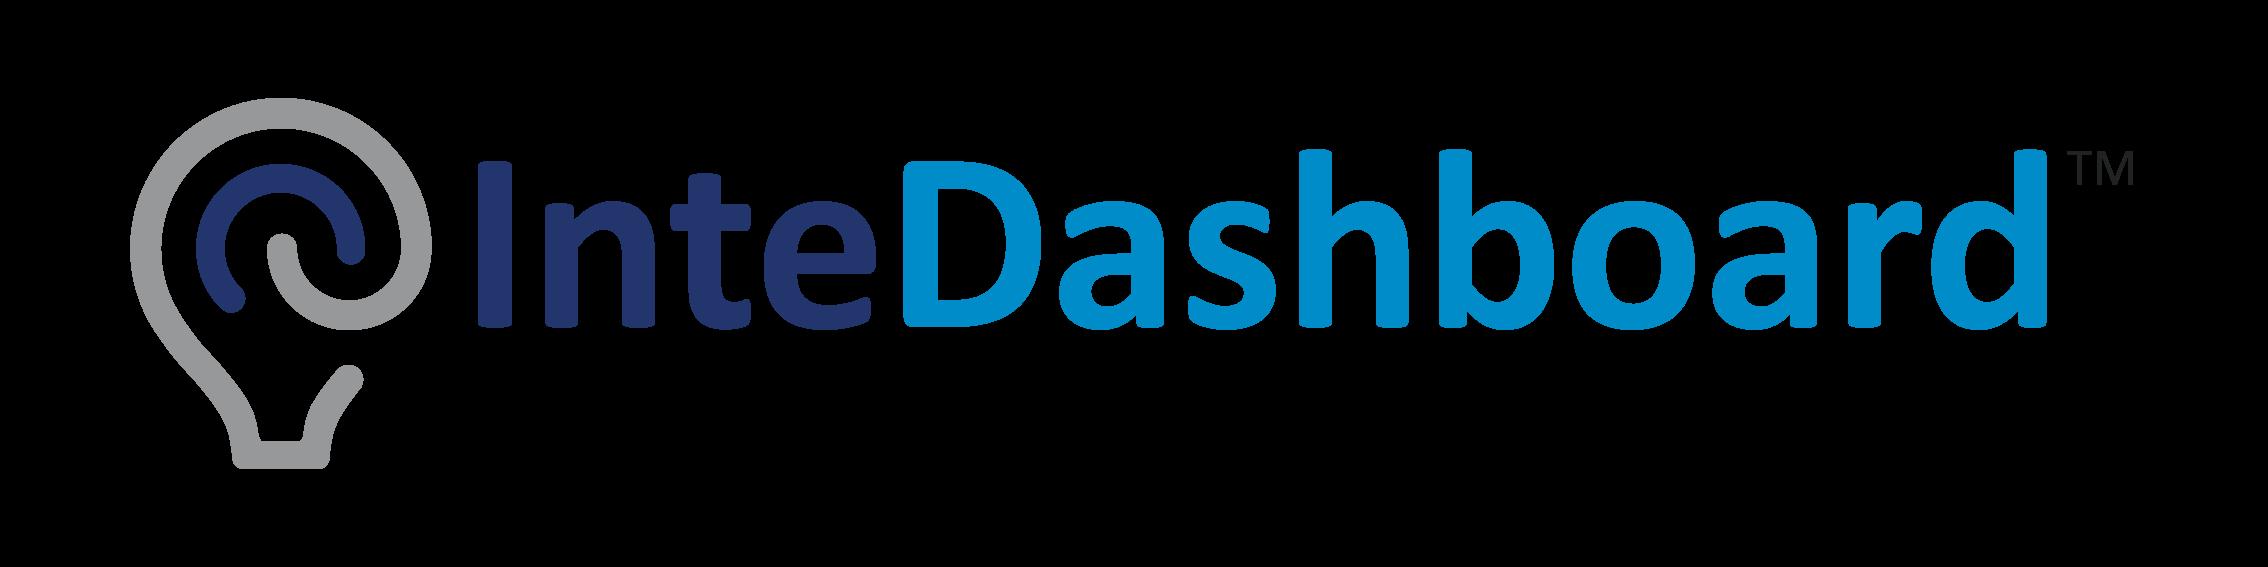 InteDashboard_Logo_V1-2